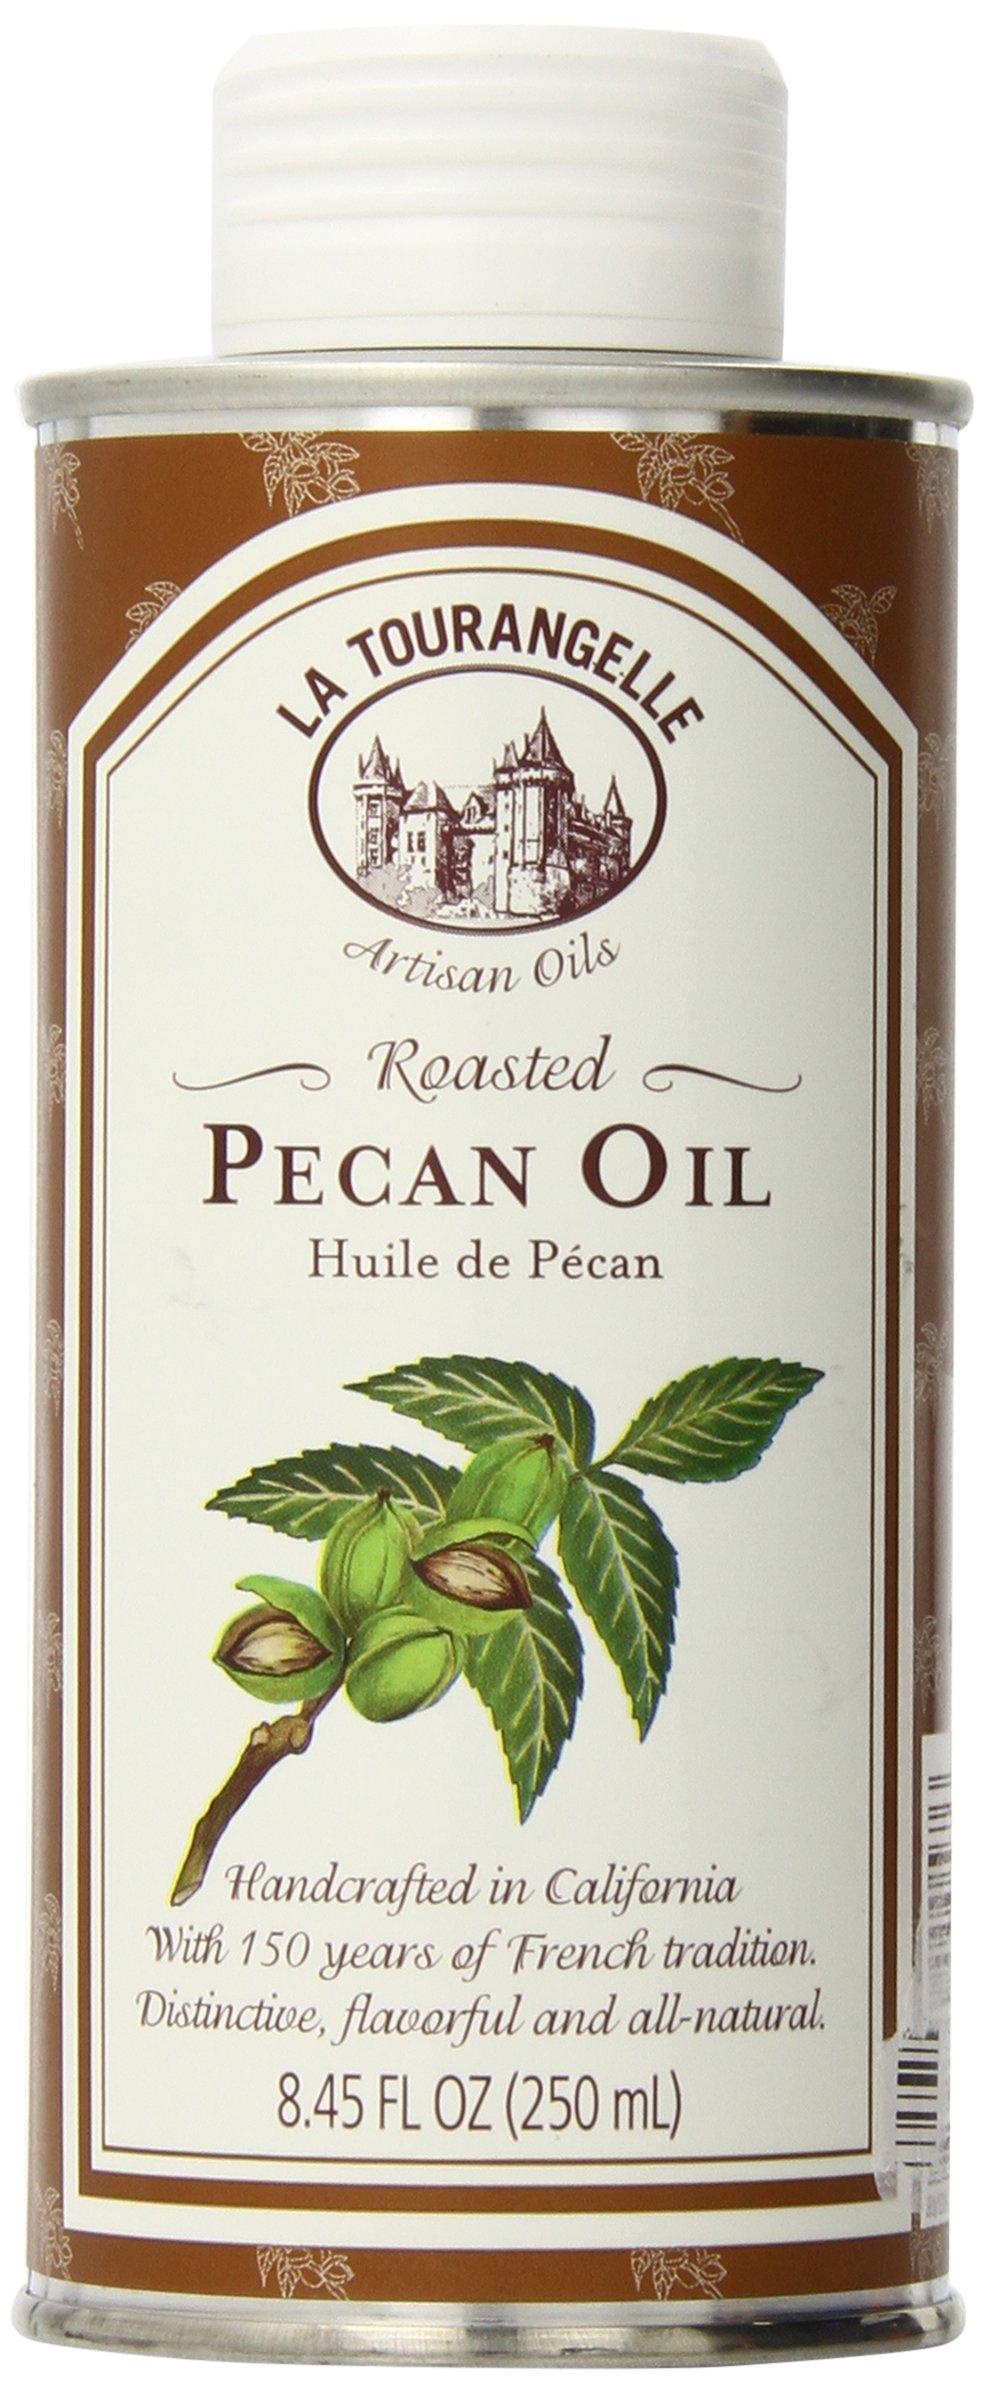 La Tourangelle, Roasted Pecan Oil, 8.45 Fl. Oz.